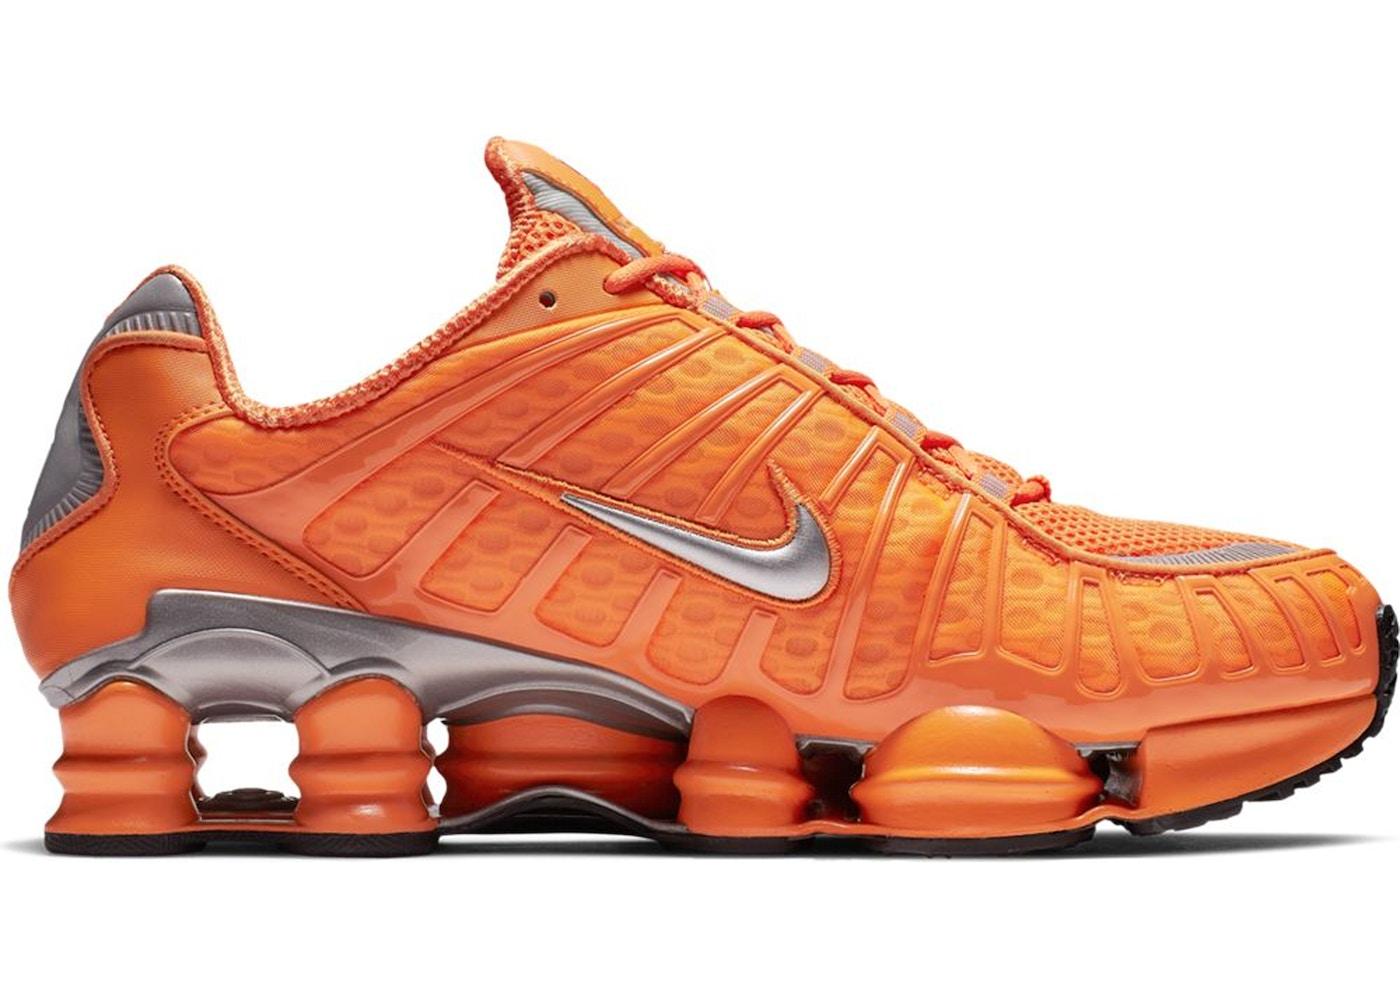 save off a6ac3 7b437 Nike Shox TL Total Orange - BV1127-800